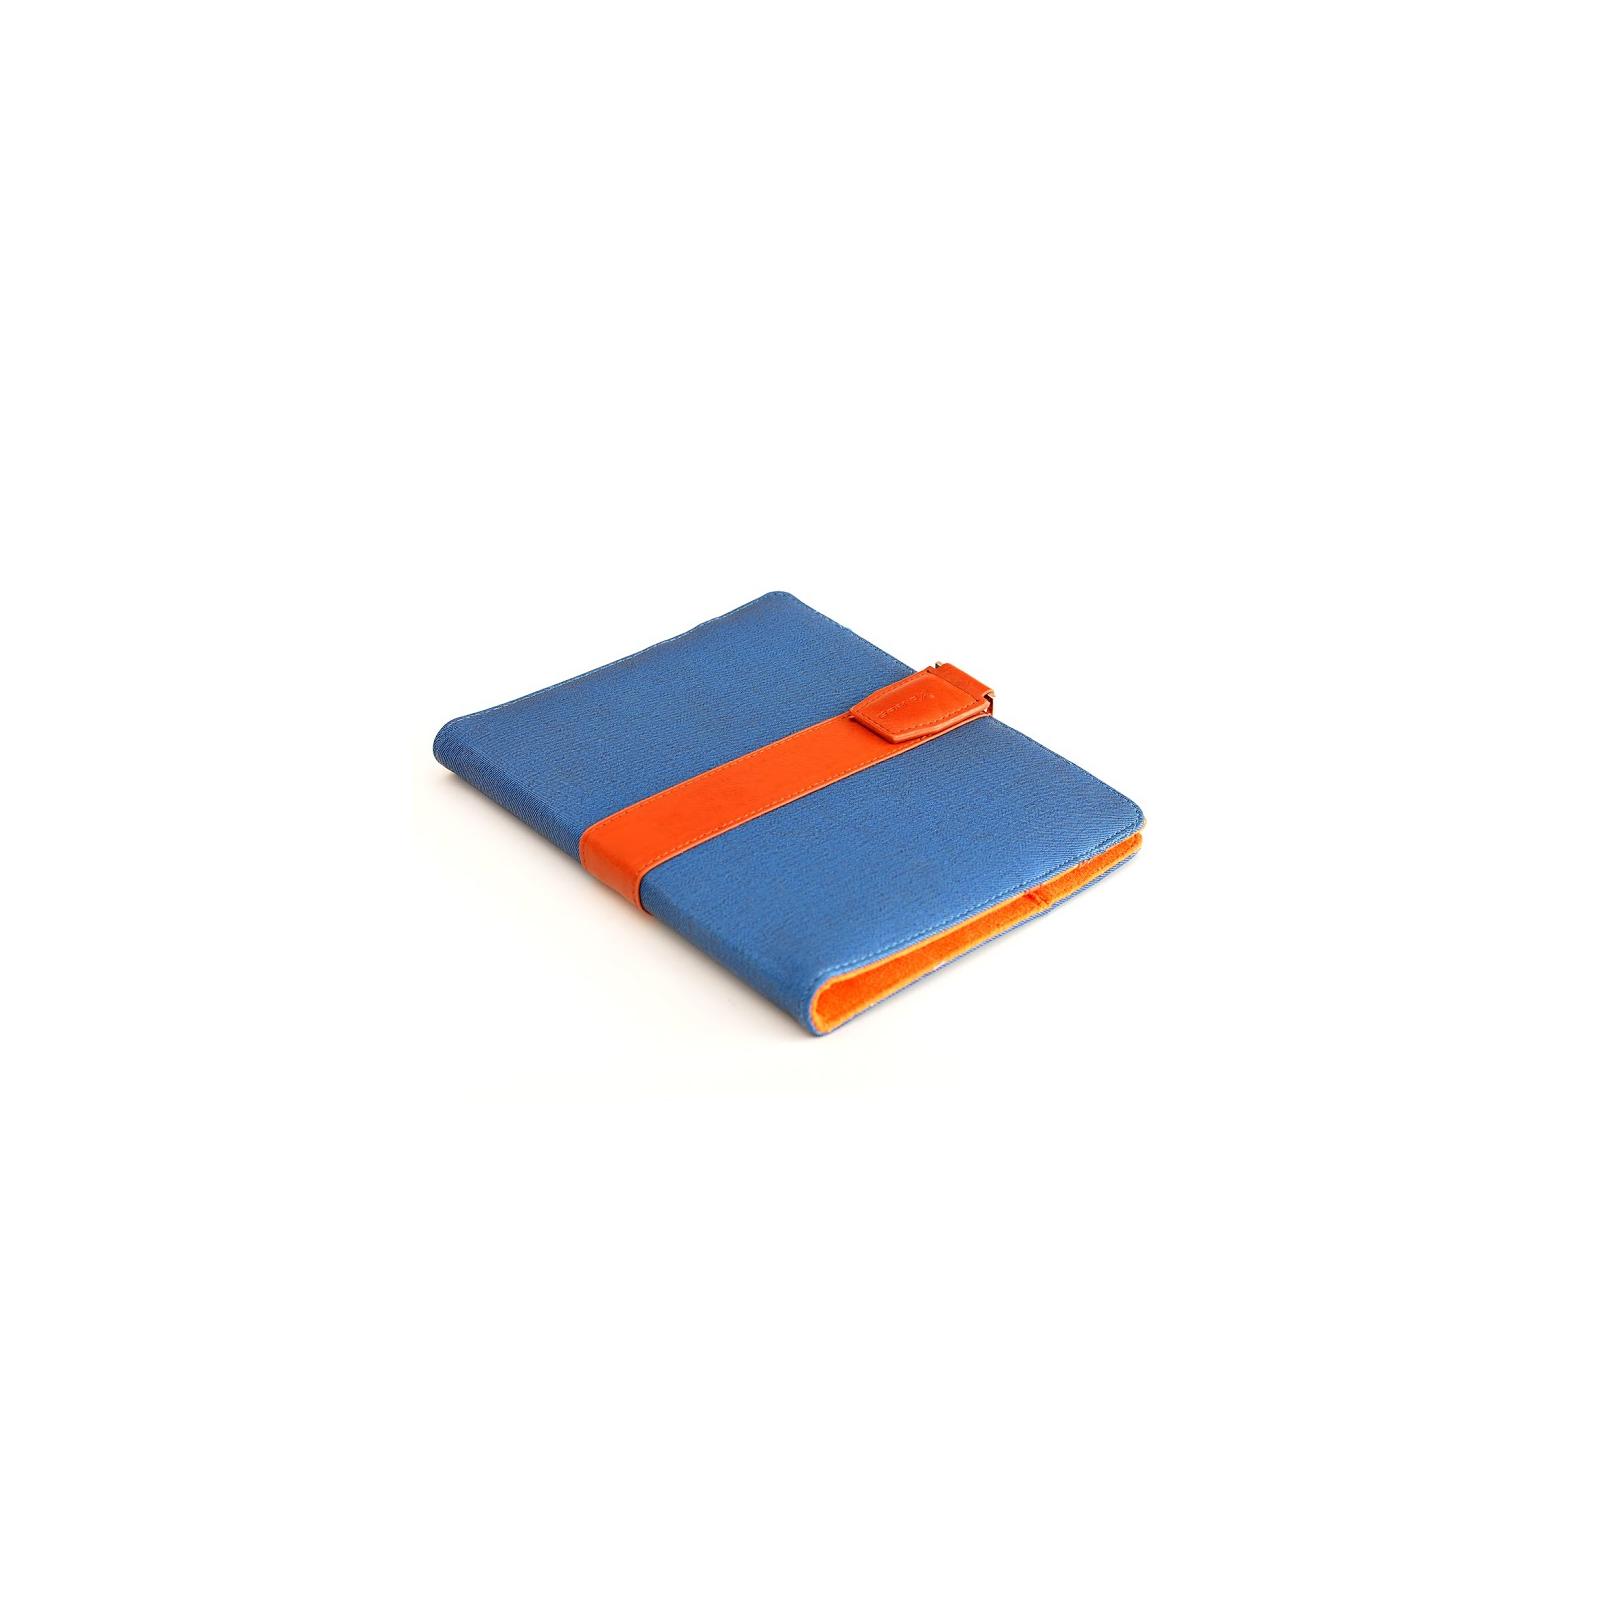 Чехол для планшета Grand-X 8 Jersey 825 Blue (UTC - JR825BL)